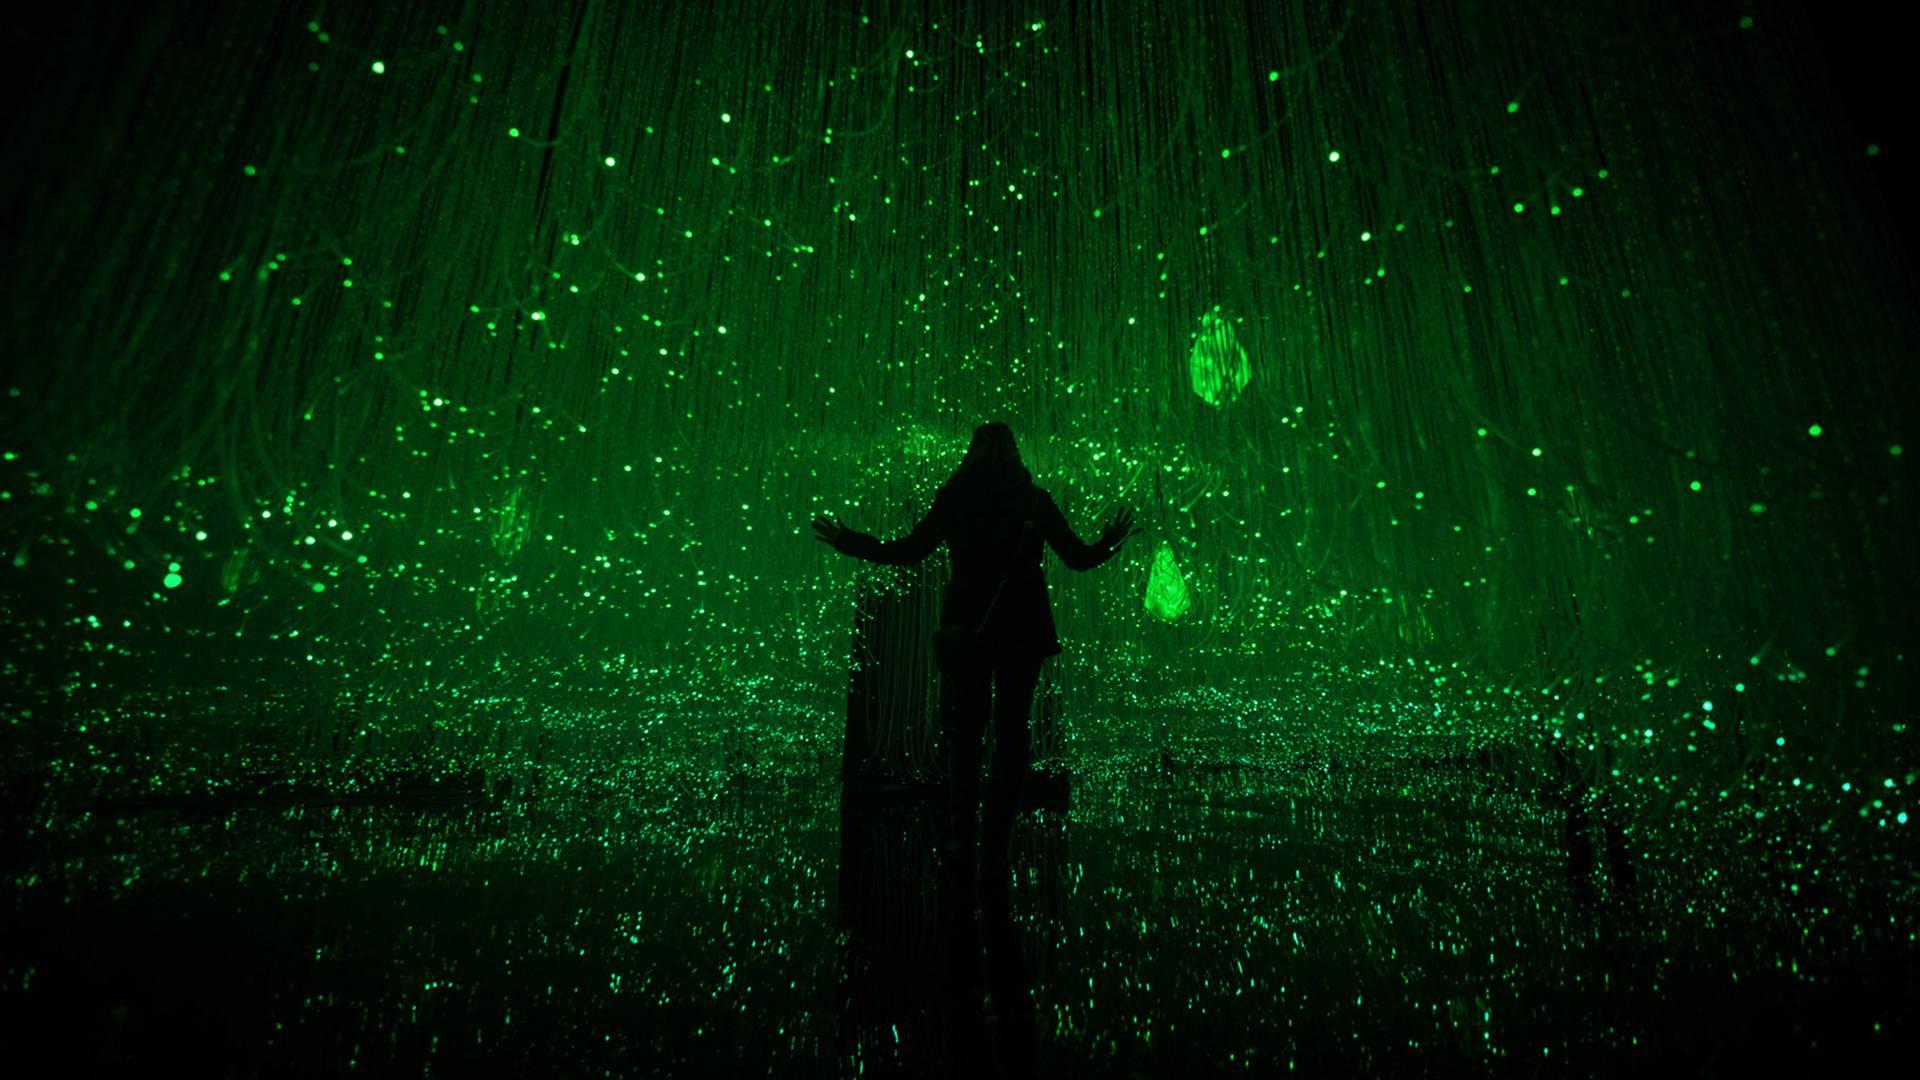 Museum of Feelings: Joyful Room, responsive fibre optic forest